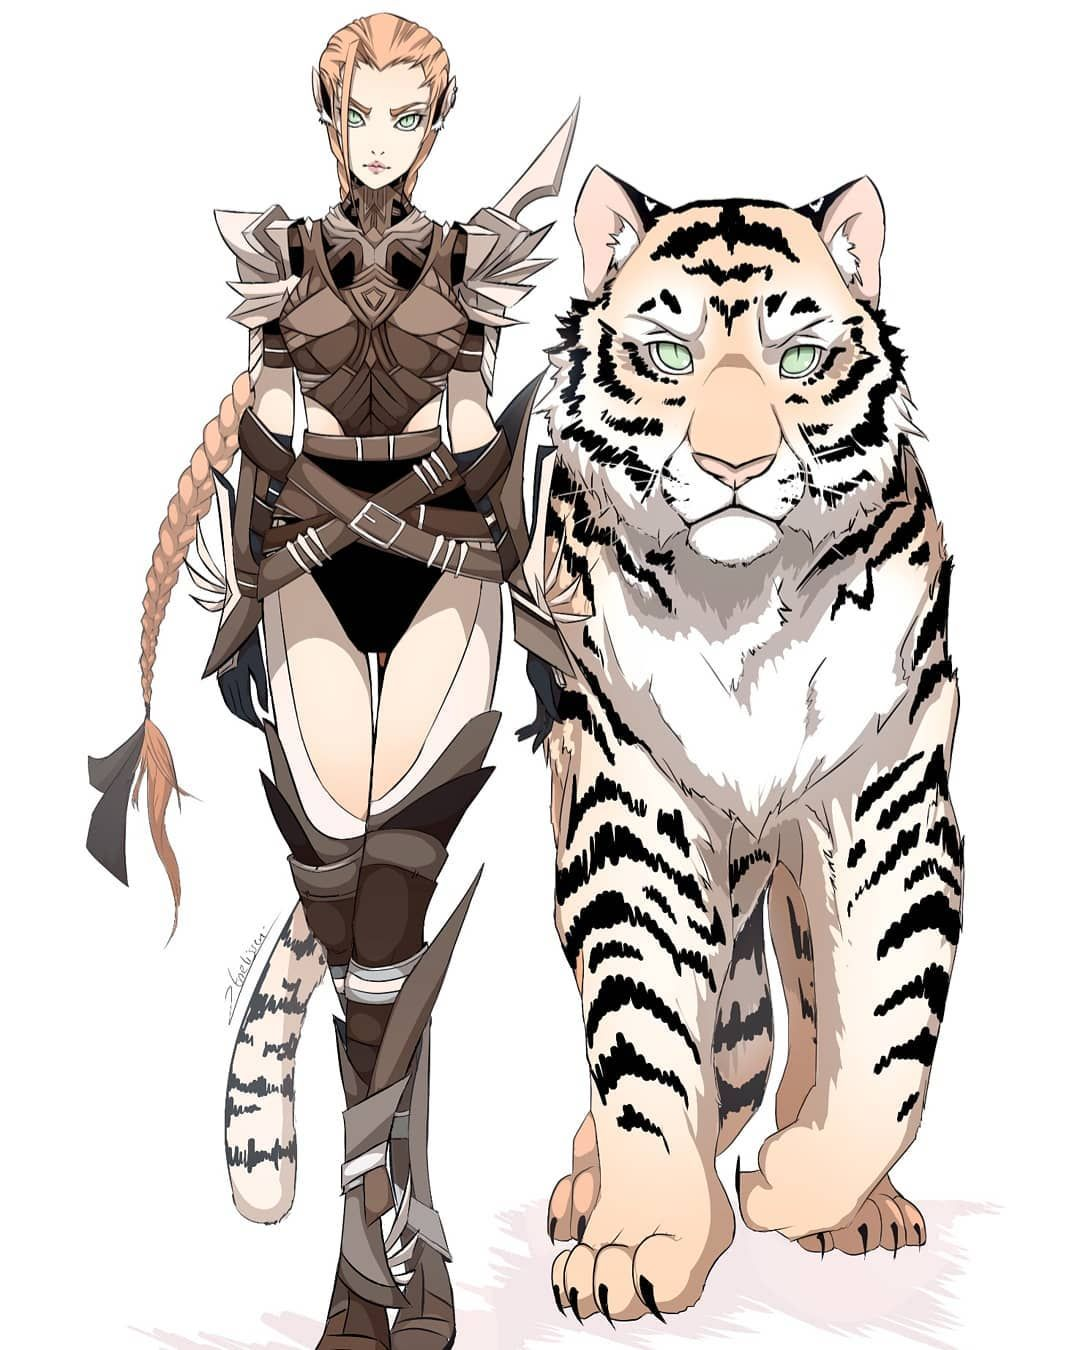 More Concept Art Conceptart Conceptartist Digitalart Tiger Tigergirl Redhead Leatherar Fantasy Art Illustrations Fantasy Character Design Tiger Girl